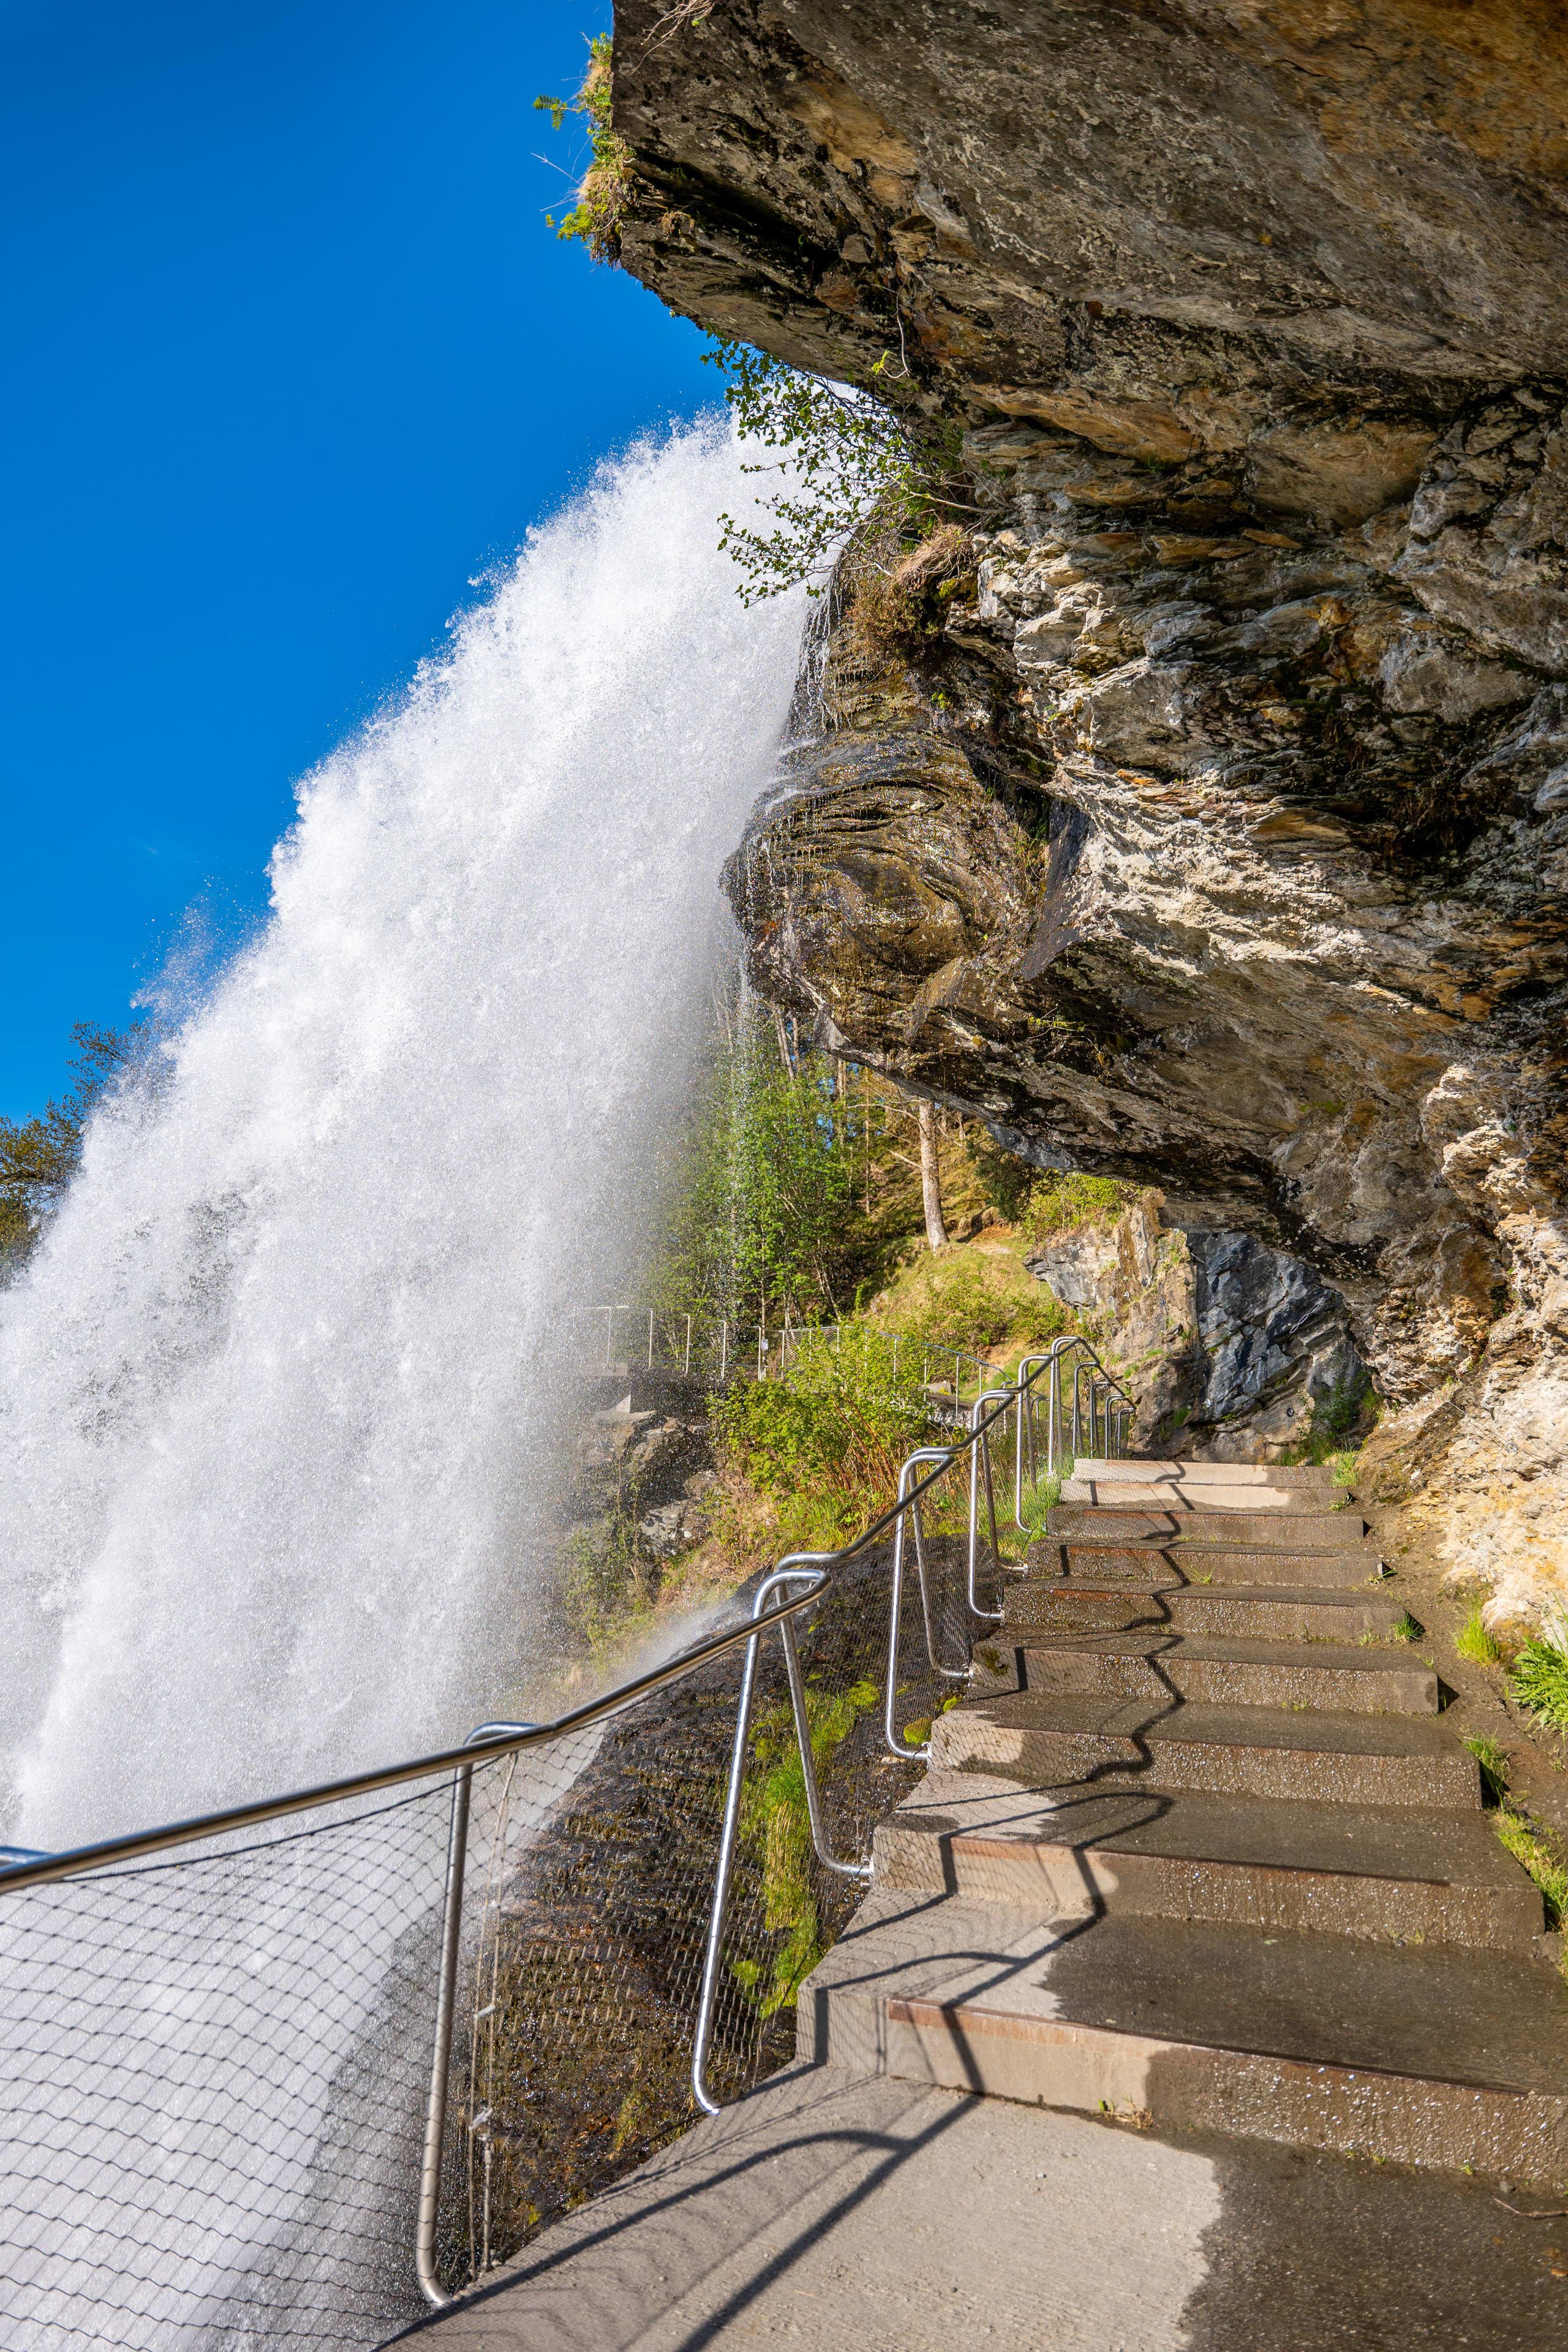 Walk behind the waterfall